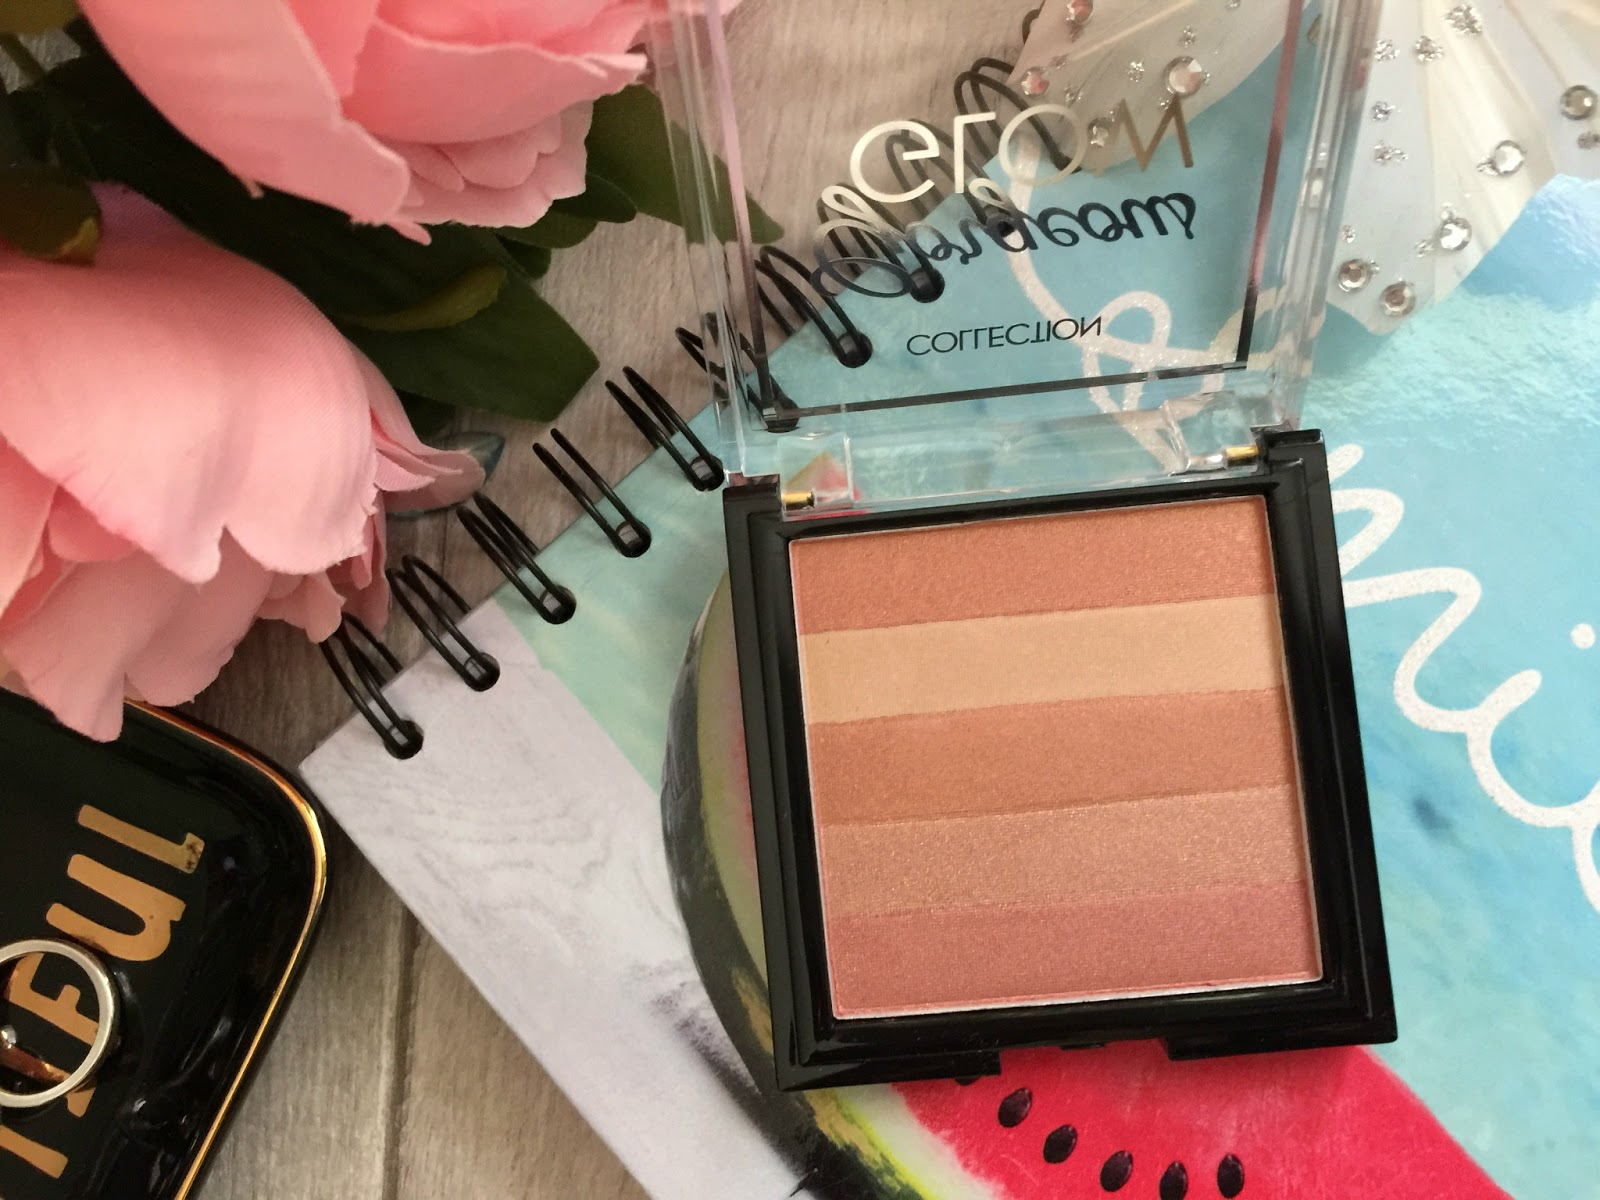 collection gorgeous glow blush block shades